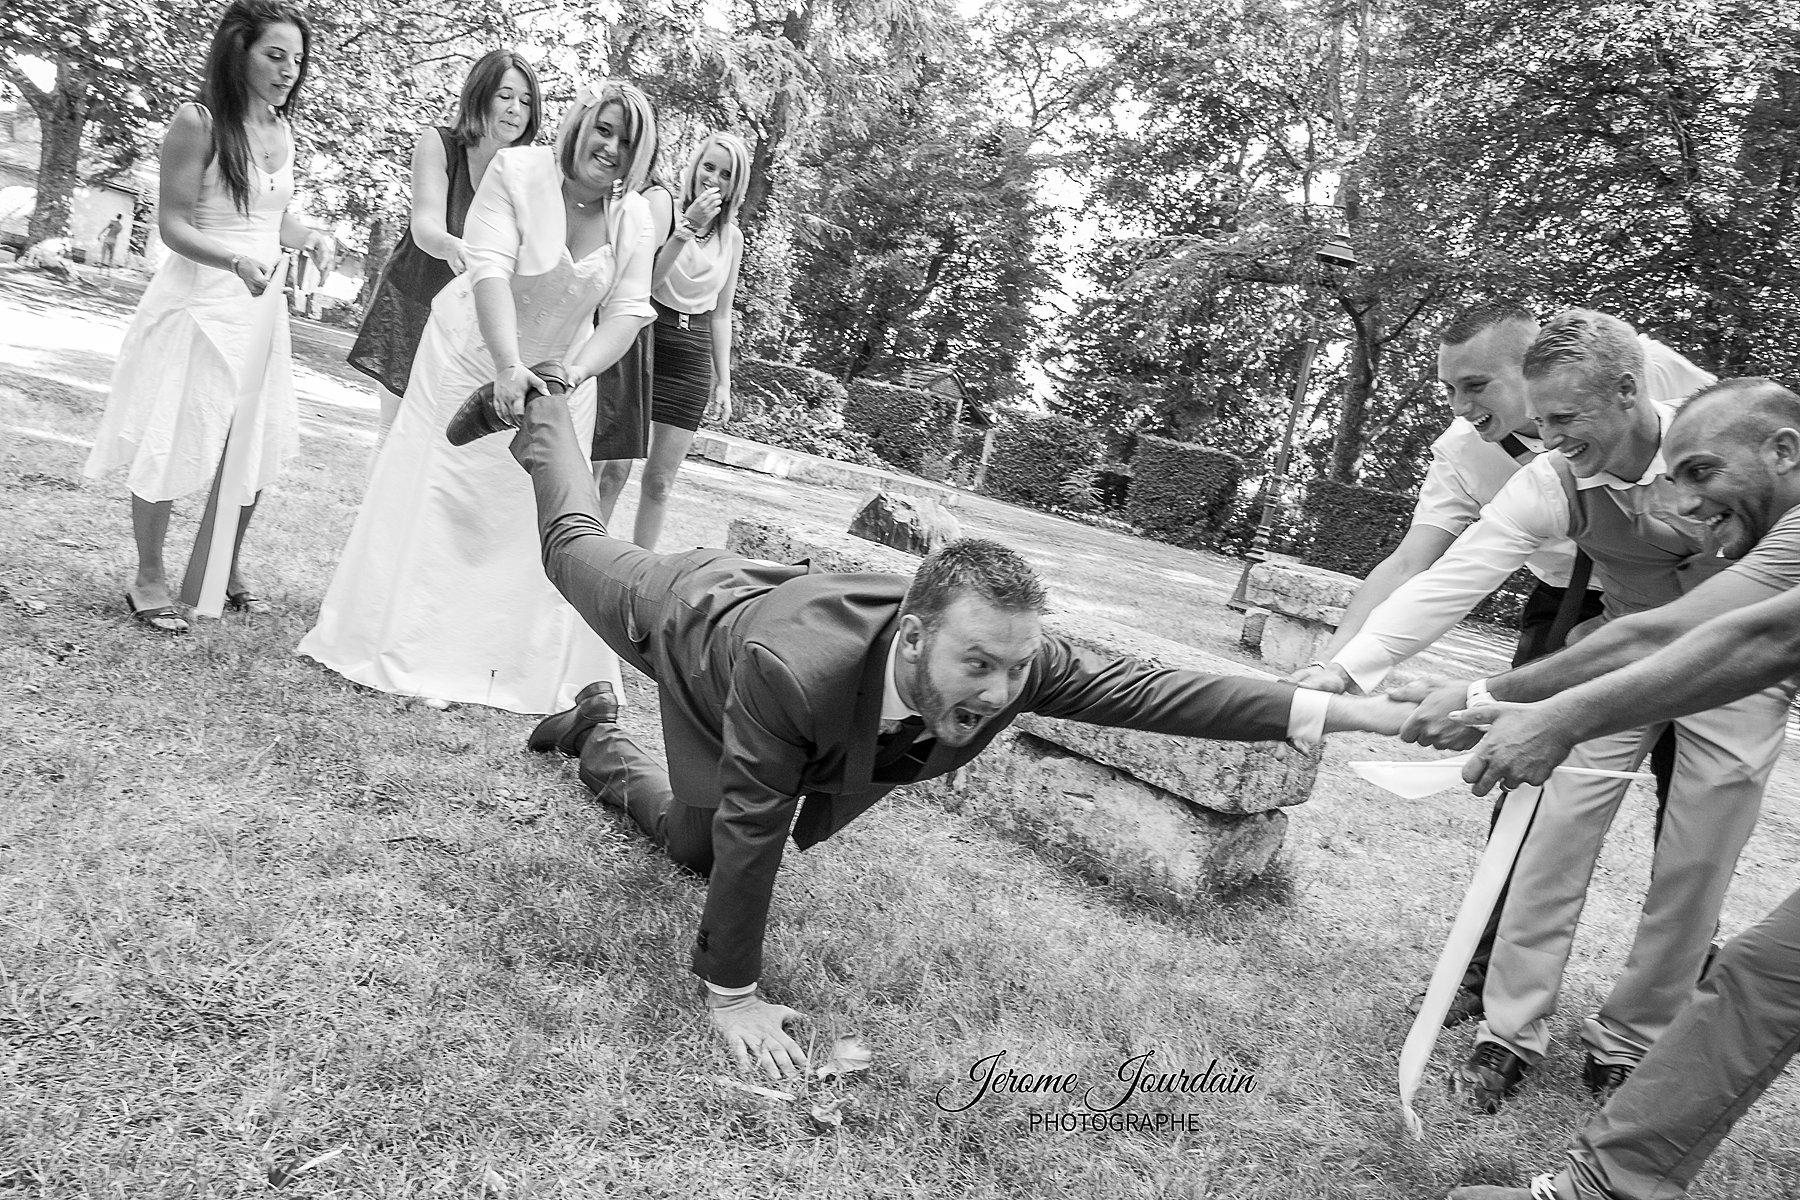 jerome jourdain photographe dordogne gironde jerome jourdain photographe mariage dordogne gironde 1 - Photographe Mariage Dordogne